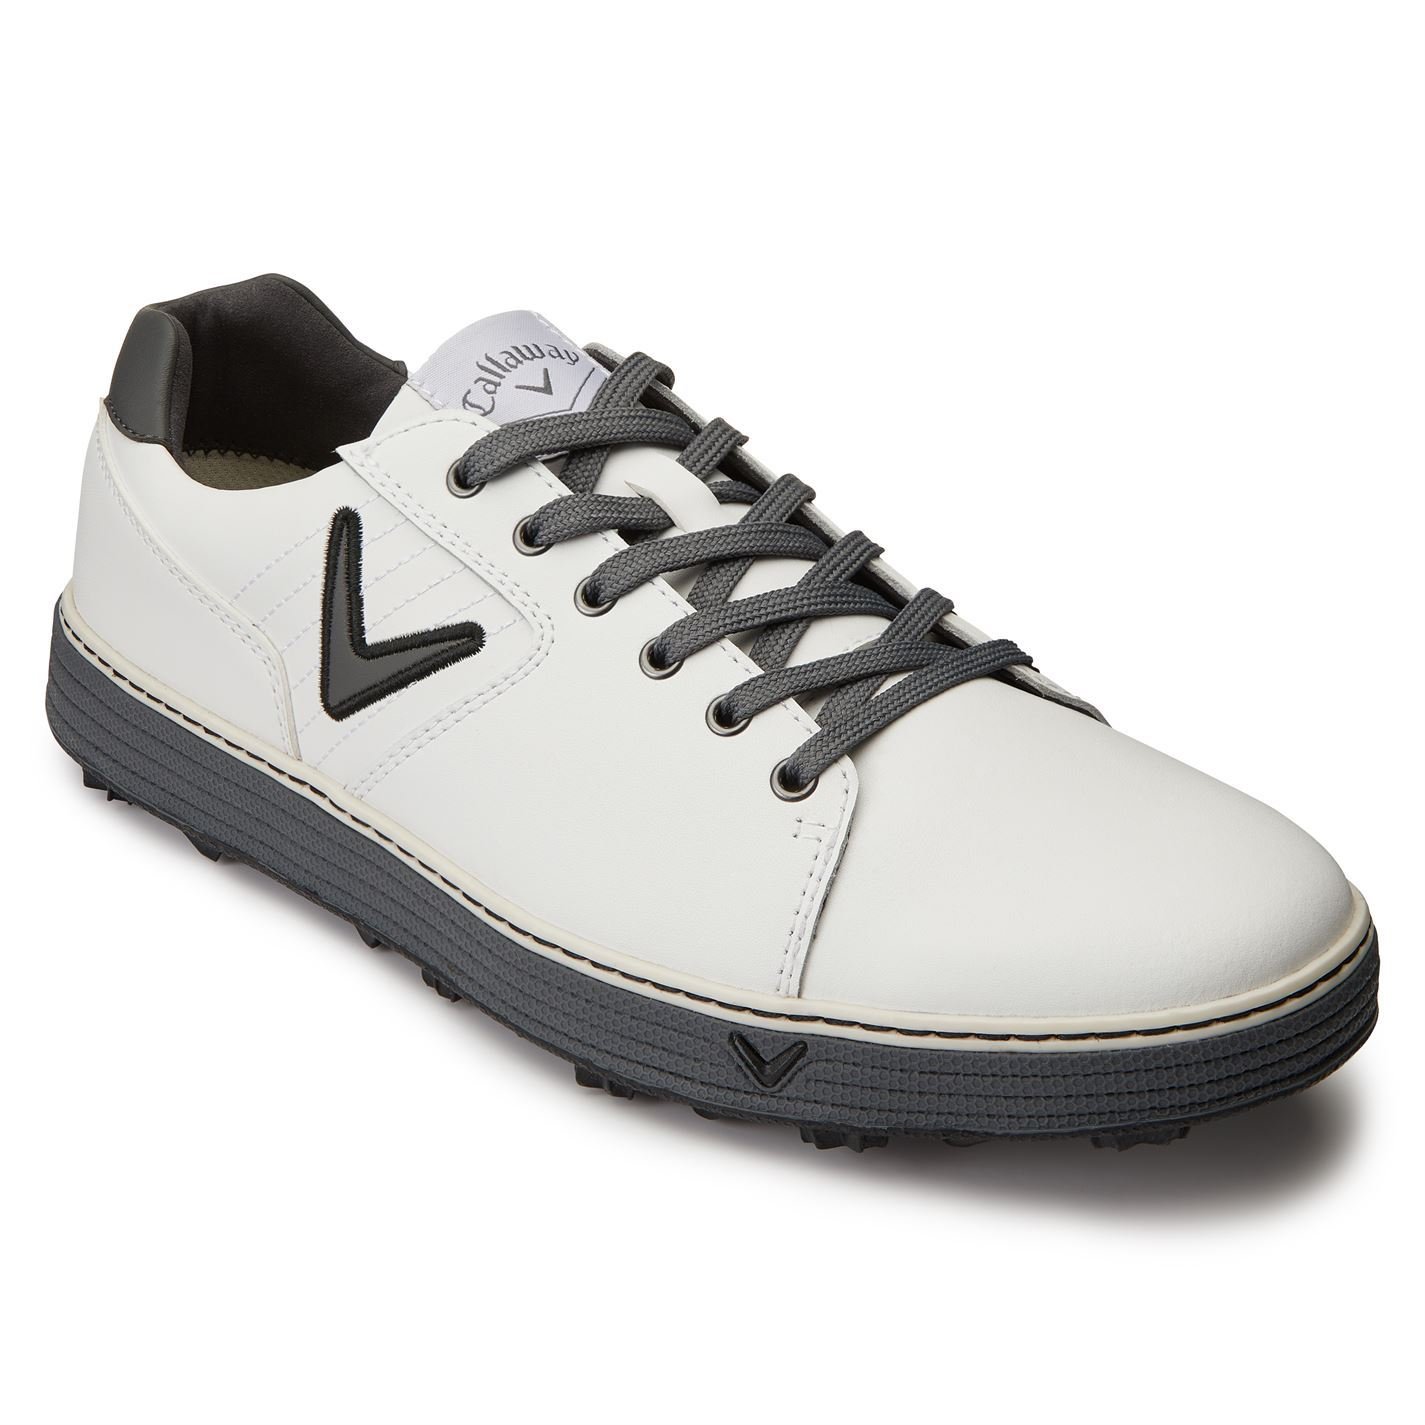 Callaway-Delmar-Urban-Golf-Shoes-Mens-Spikeless-Footwear thumbnail 12